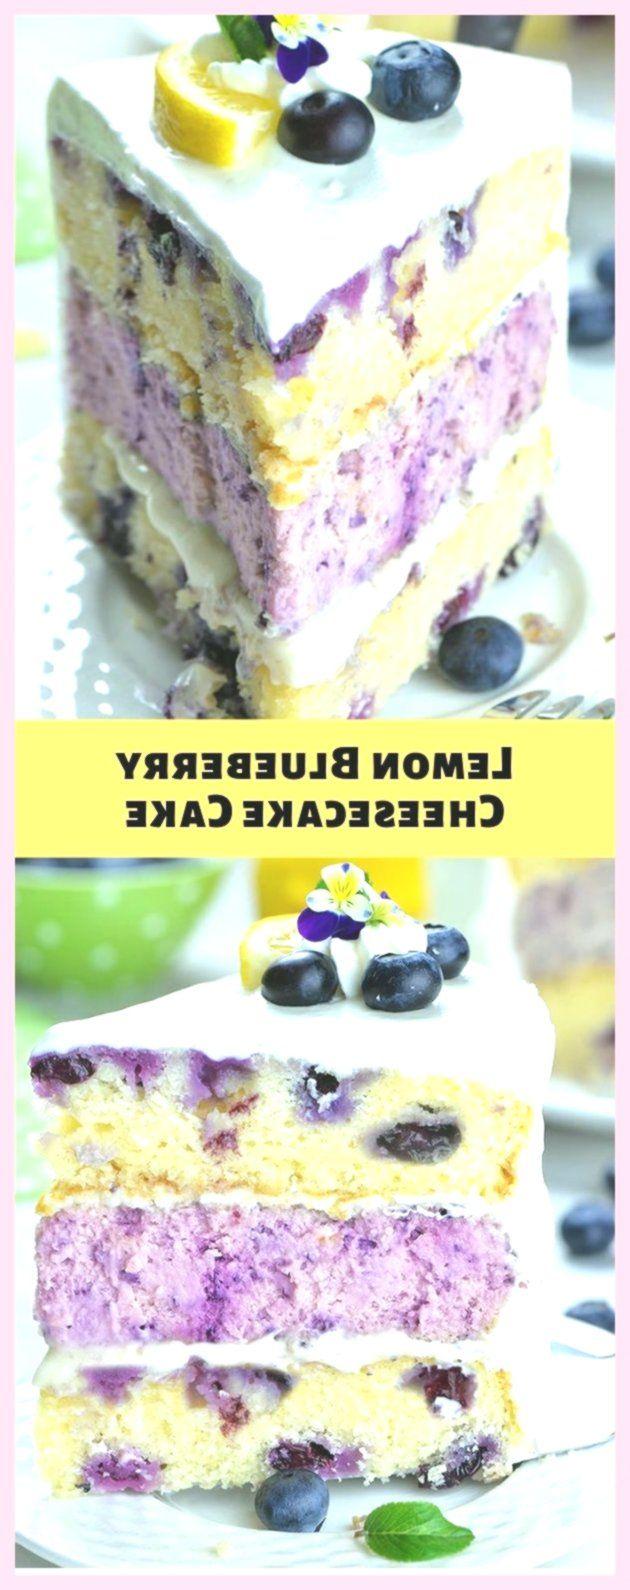 New Easy Cake : Lemon Blueberry Cheesecake Cake #cake #dessert,  #blueberry #cheesecake #dess... #lemonblueberrycheesecake